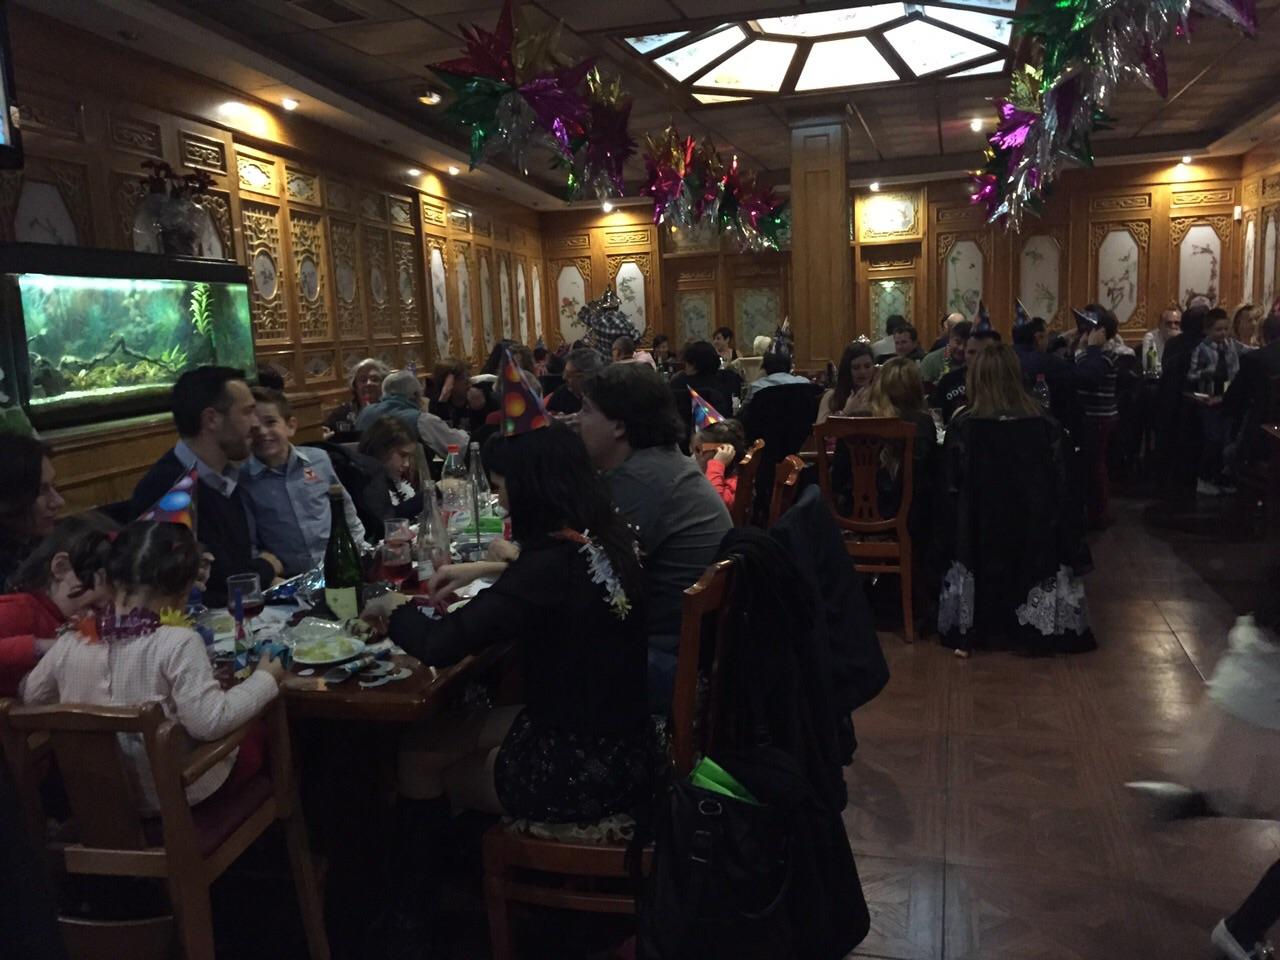 Restaurante chino long teng l 39 eliana valencia - Restaurantes valencia nochevieja ...